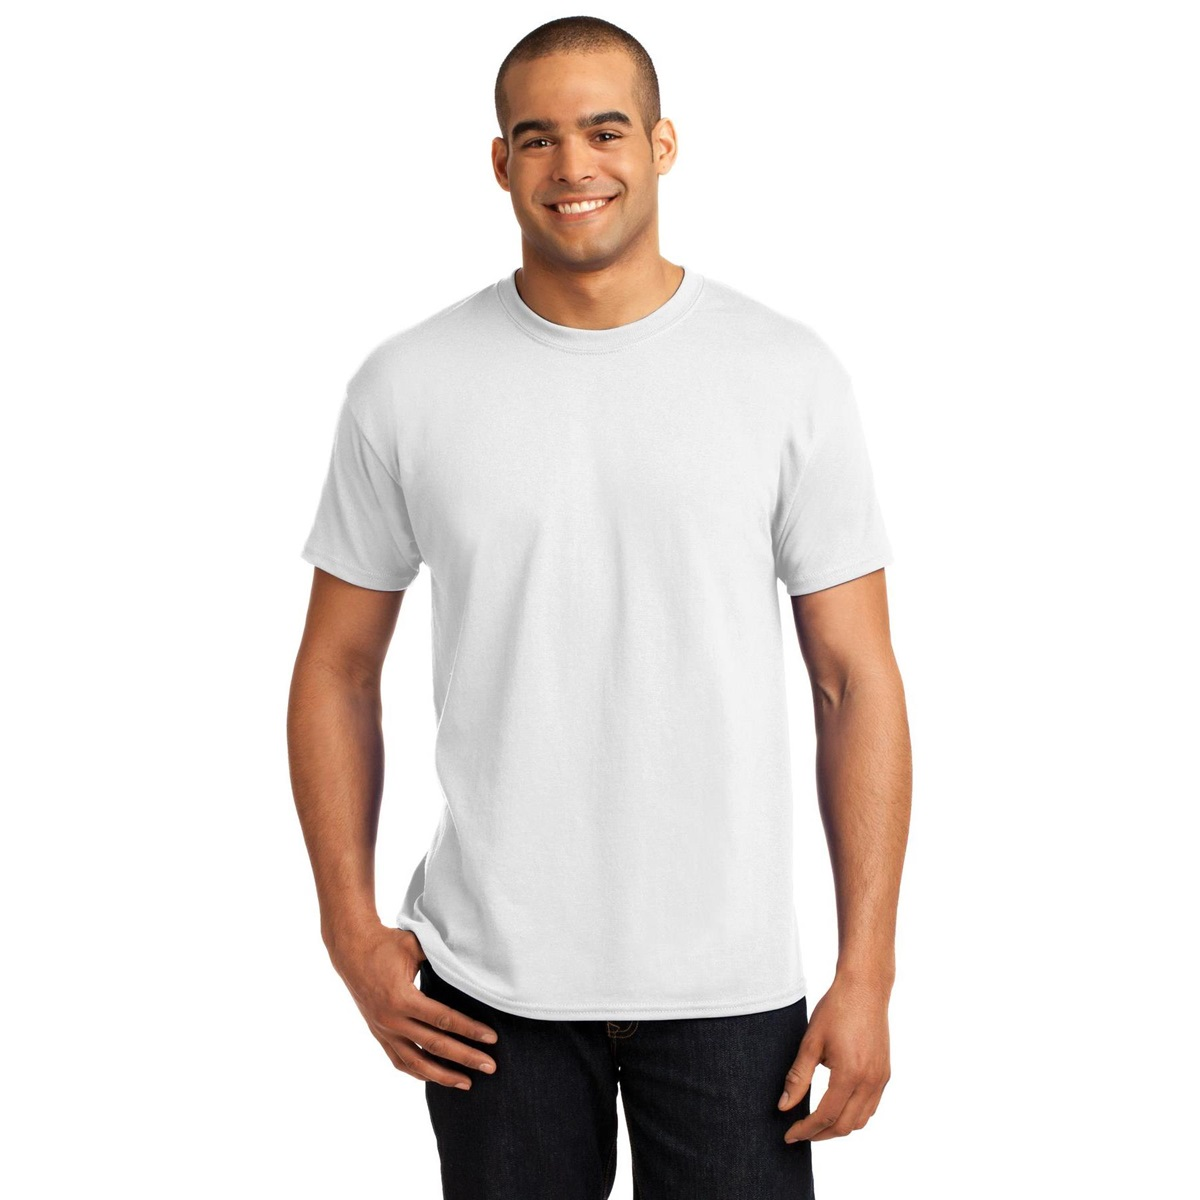 Hanes 5170 comfortblend ecosmart cotton polyester t shirt for Poly blend t shirts wholesale